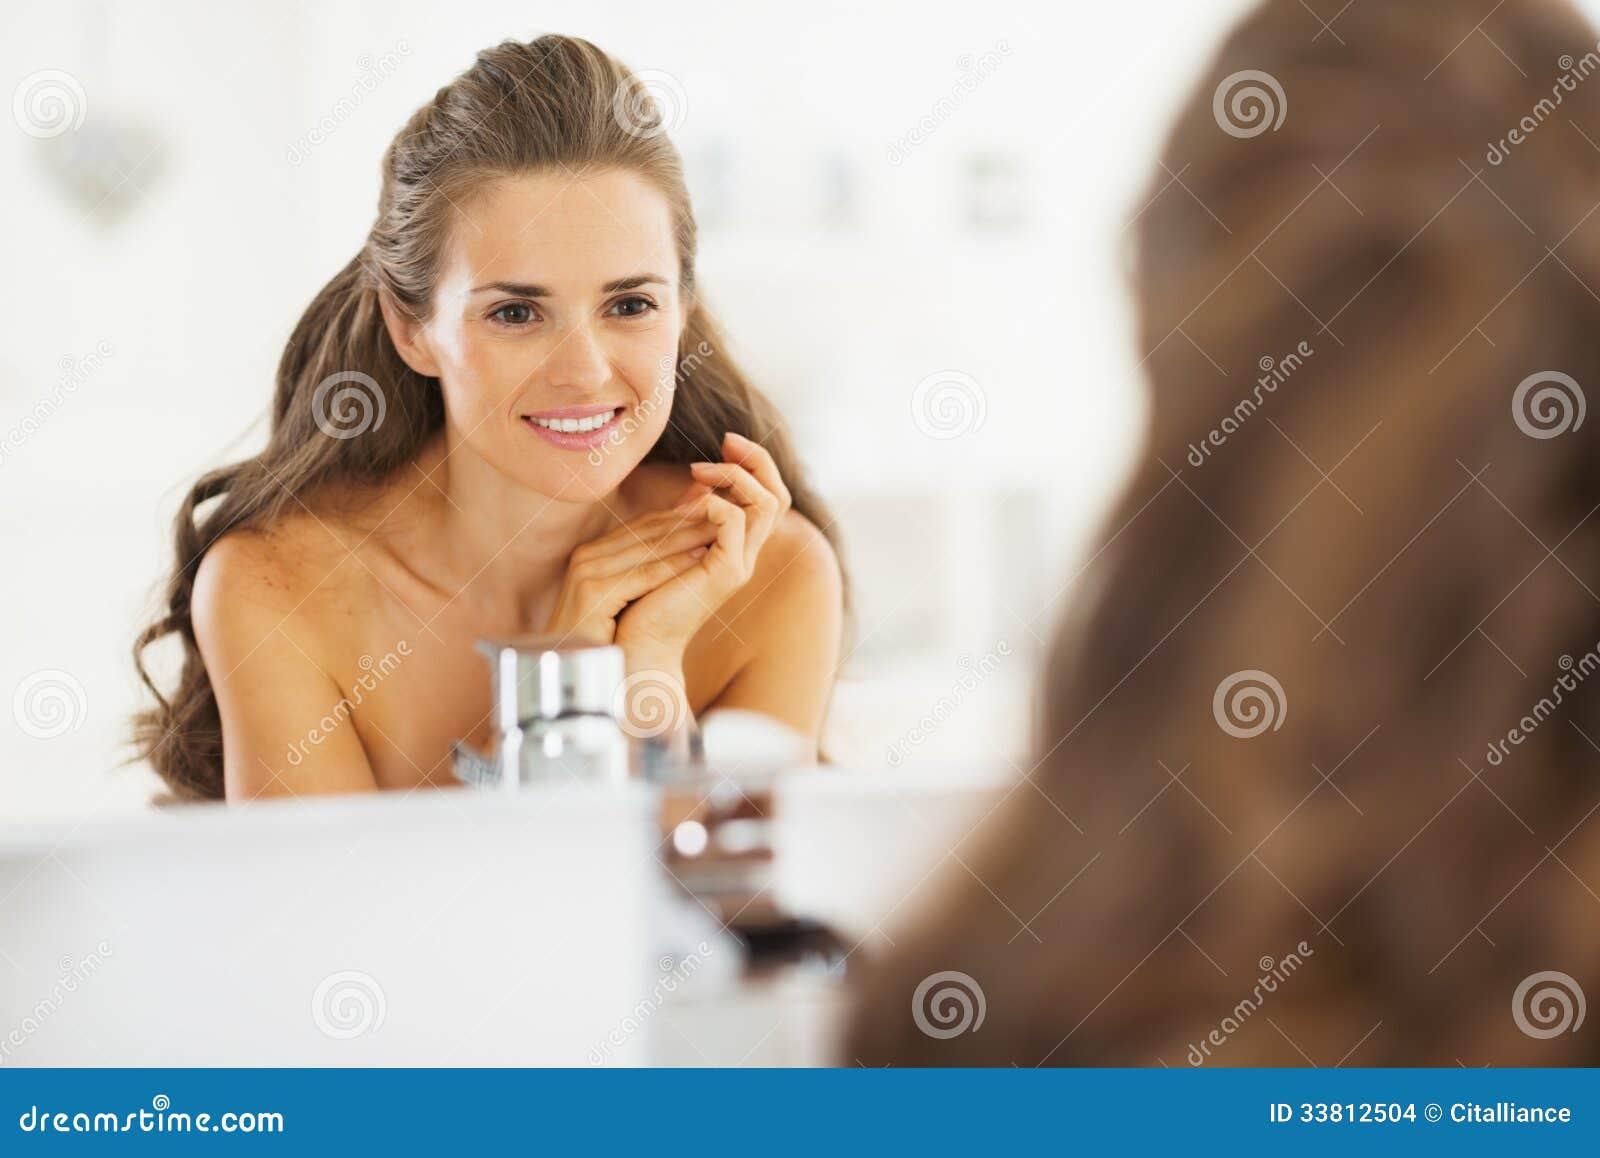 portrait of happy young woman looking in mirror in bathroom stock